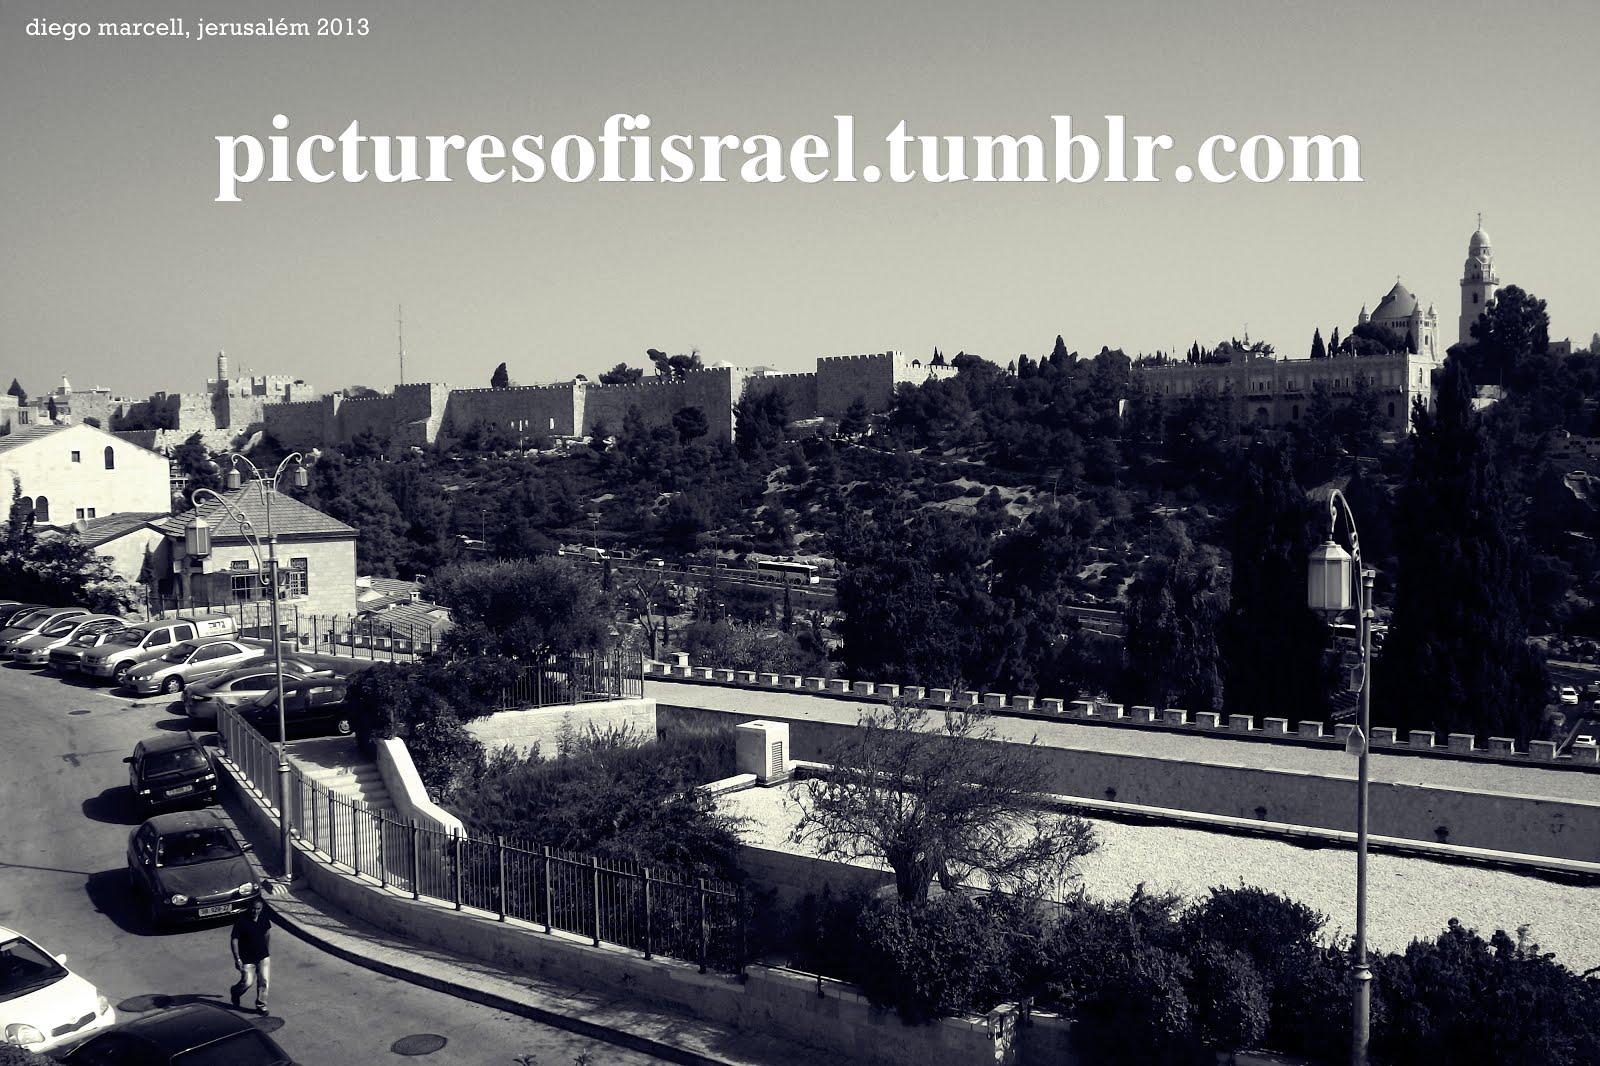 Projeto Imagens de Israel